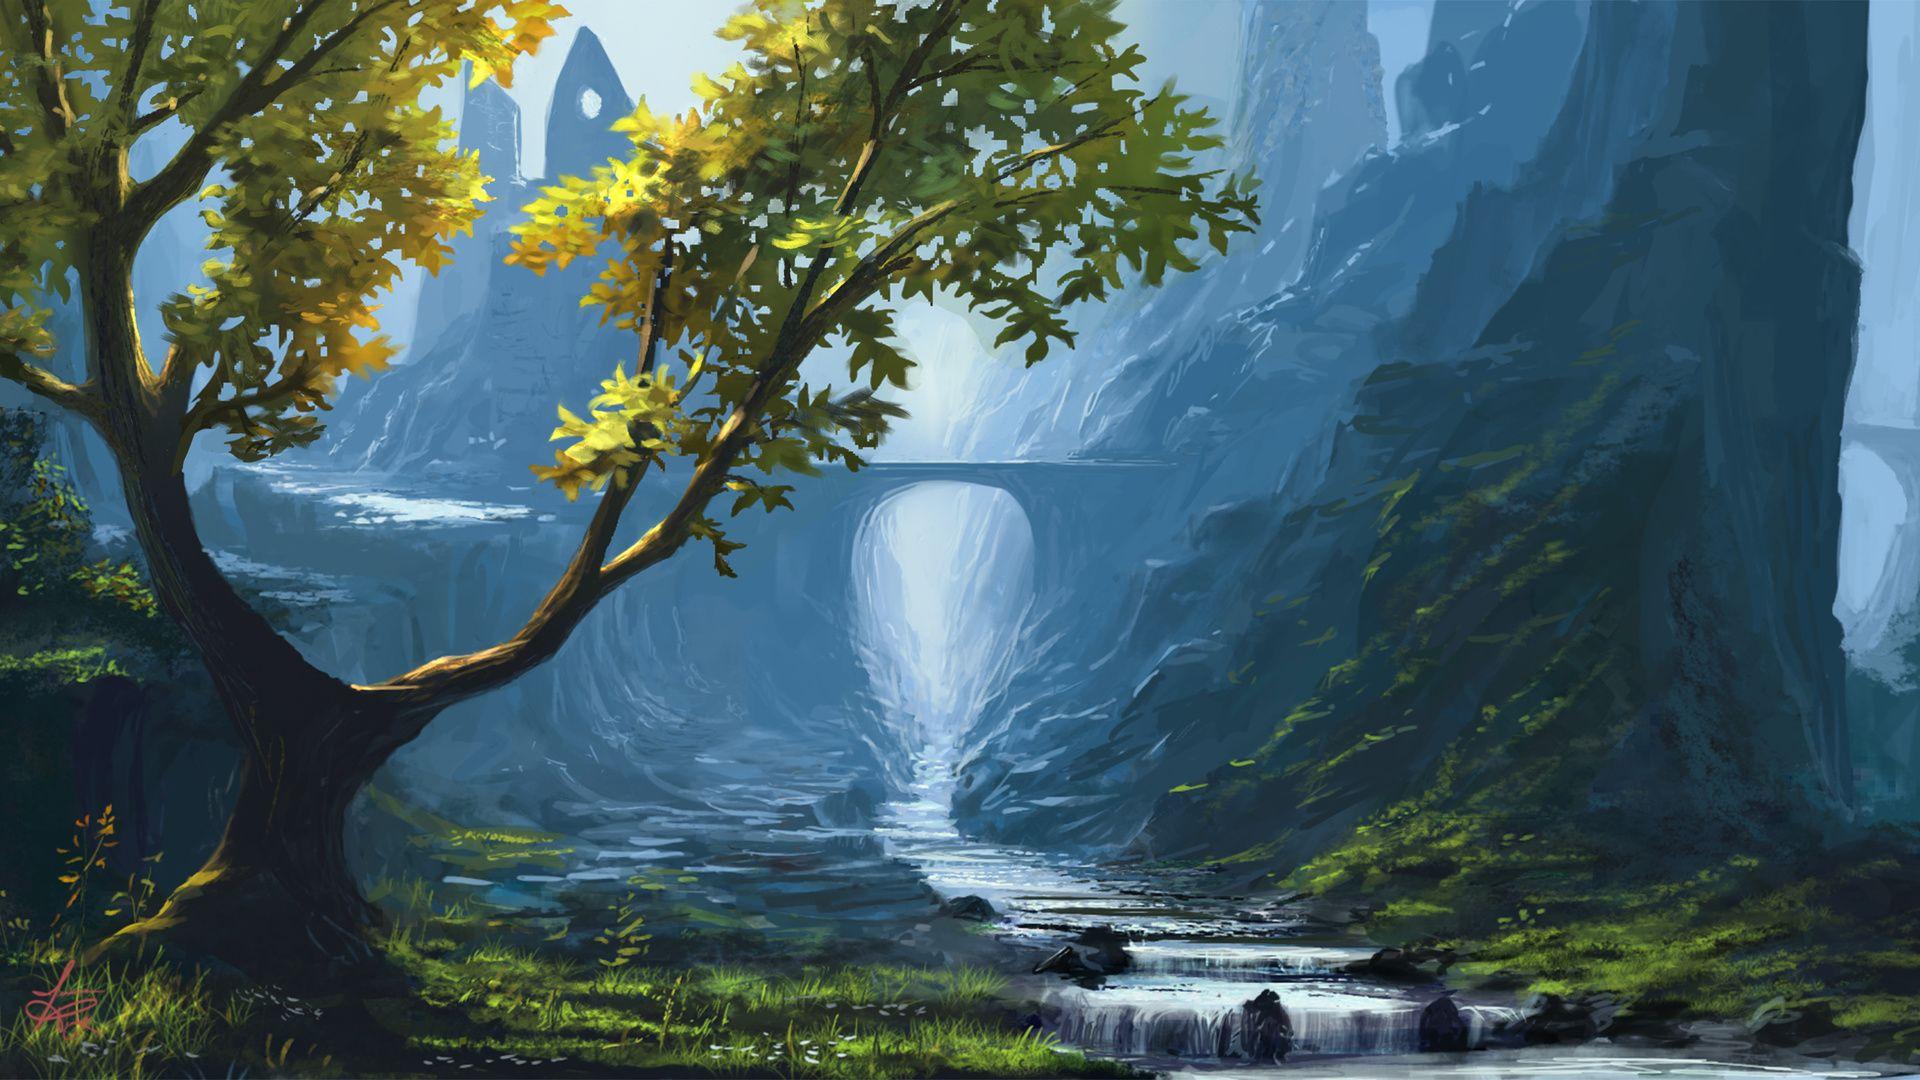 Digital Art Background nice wallpaper